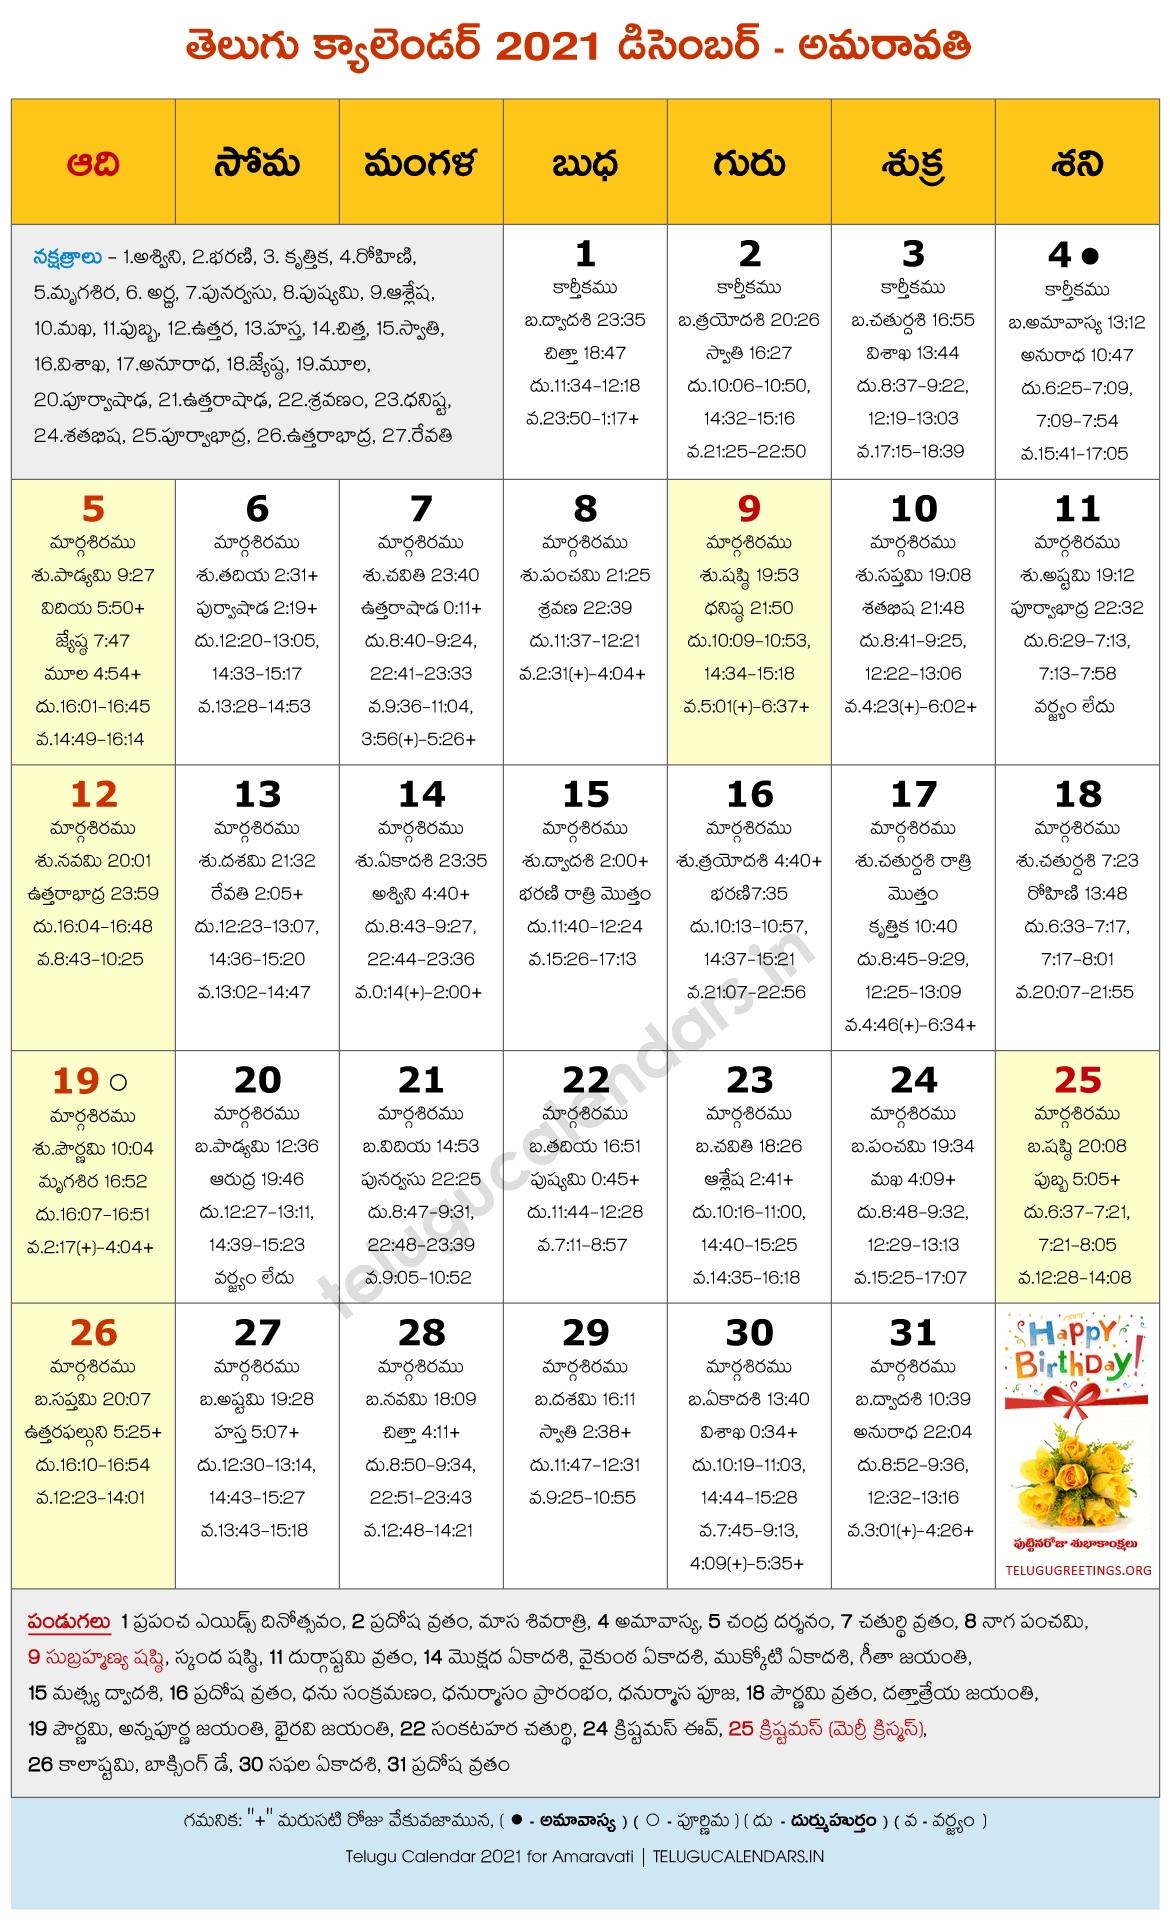 Telugu Calendar 2021 December Andhra Pradesh | Calendar May 2021 Telugu Calendar 2021 October Andhra Pradesh